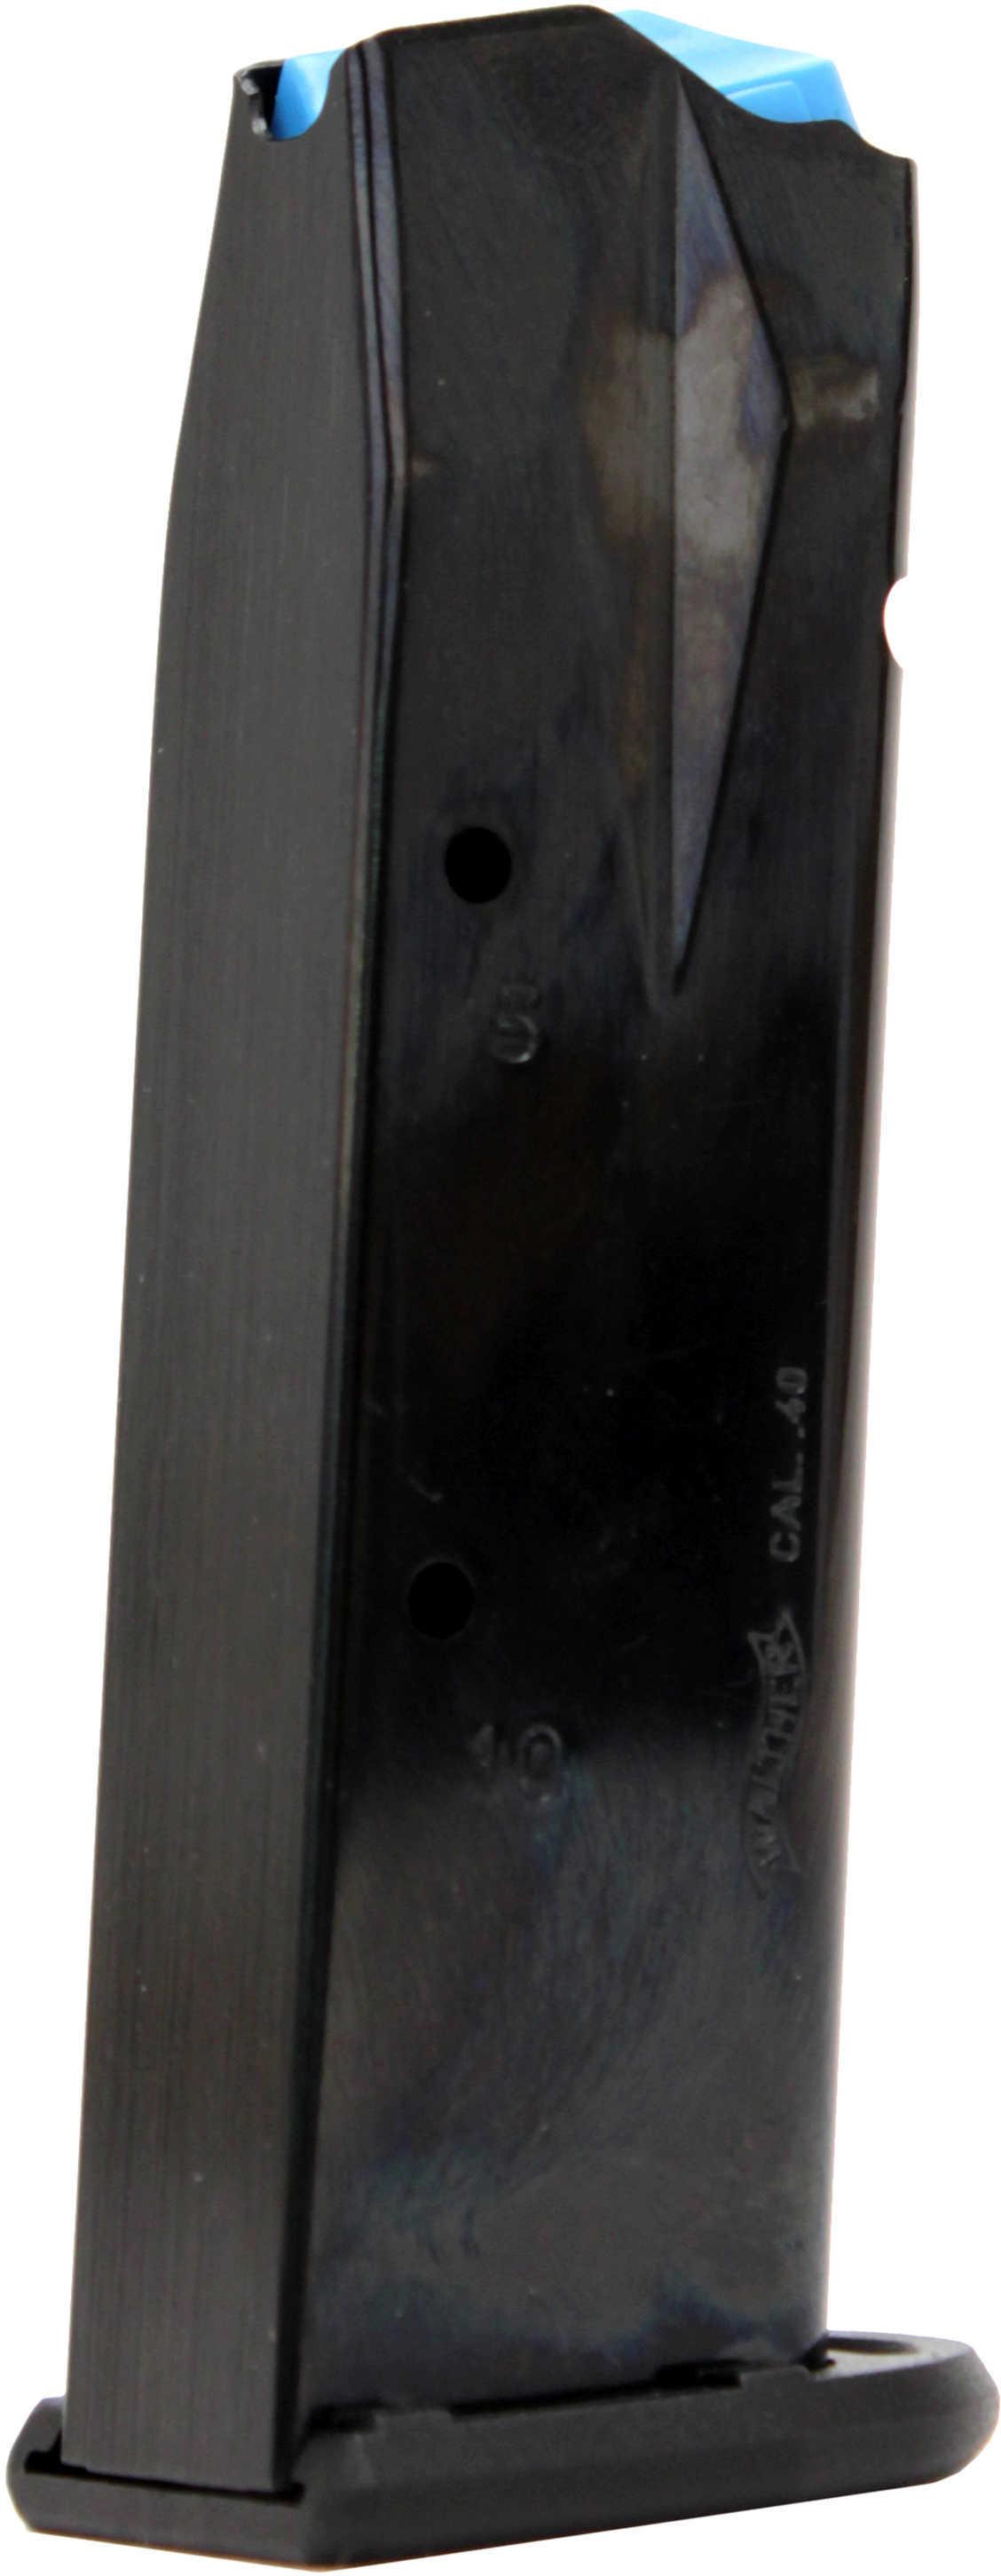 Walther P99 .40 Smith & Wesson Magazine 12 Round Magazine Md: 2796520